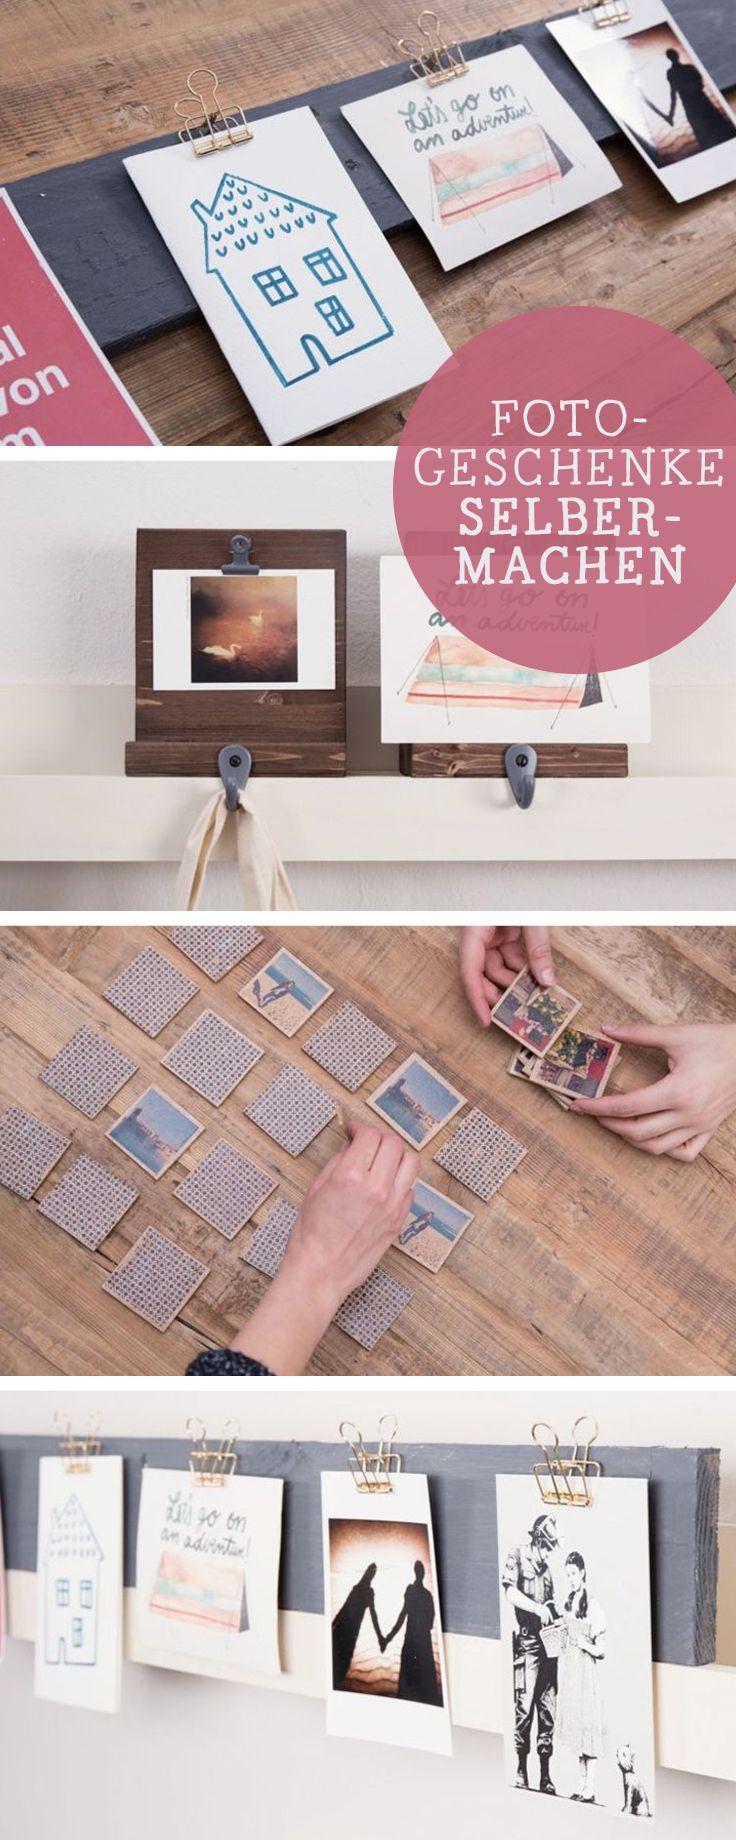 Fotos verschenken: DIY-Ideen für Fotogeschenke / photo  gift ideas, diy tutorials via DaWanda.com